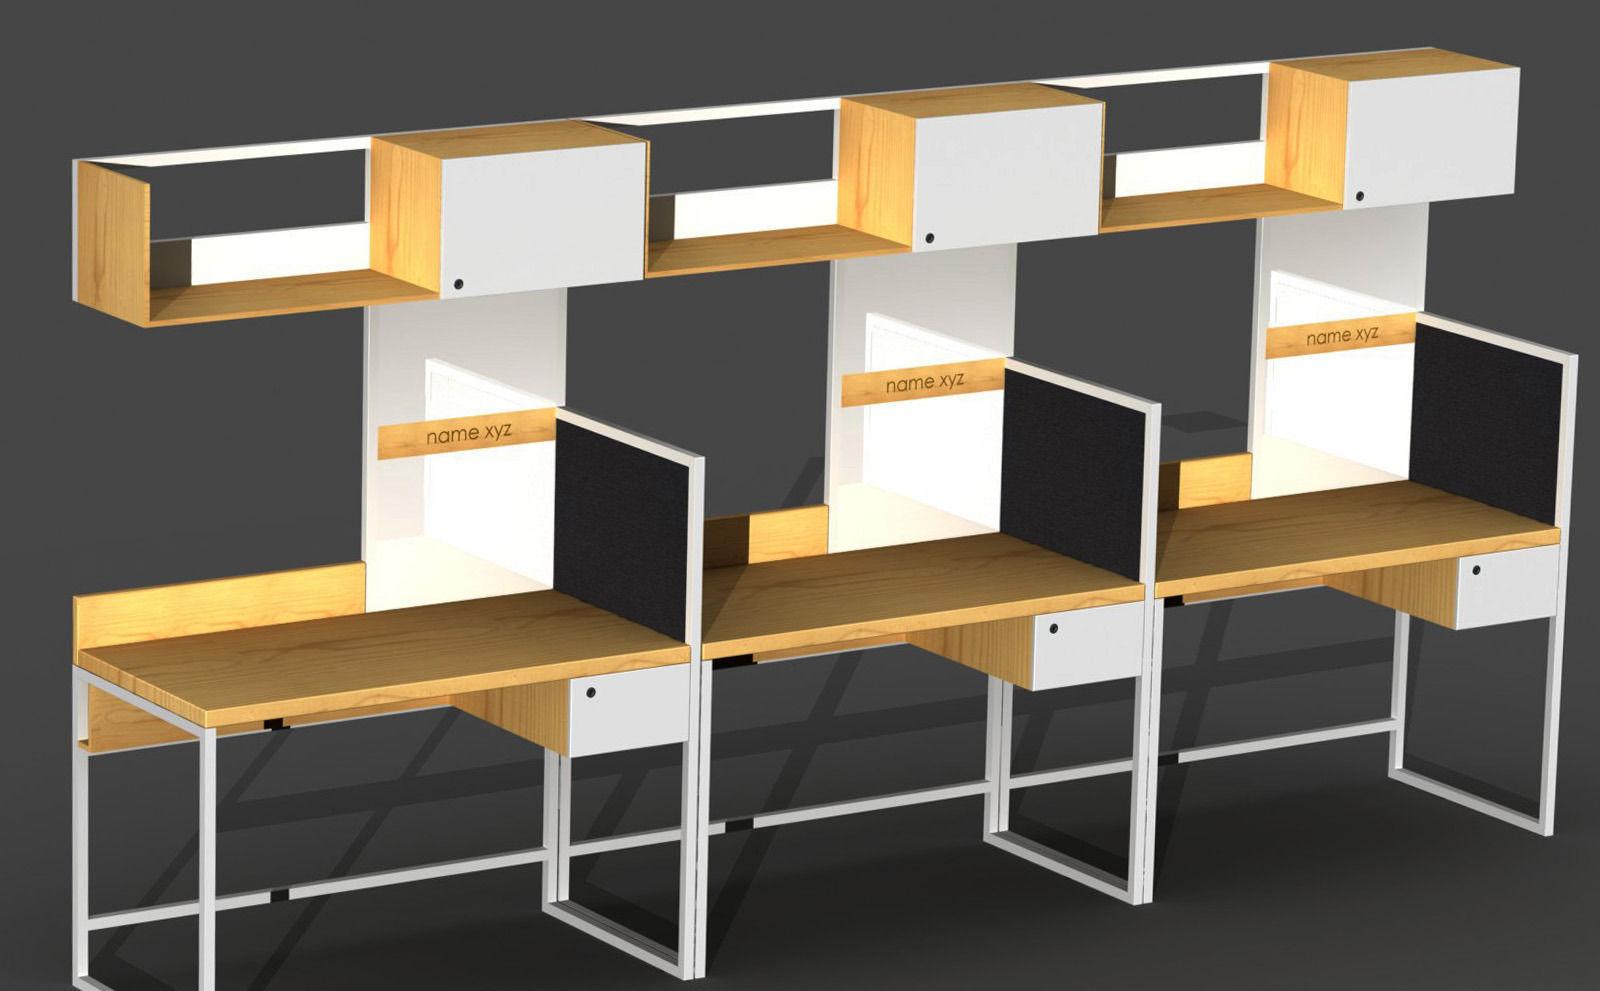 office workstation designs. Office Workstation Design 3d Model Sldprt Sldasm Slddrw Designs T